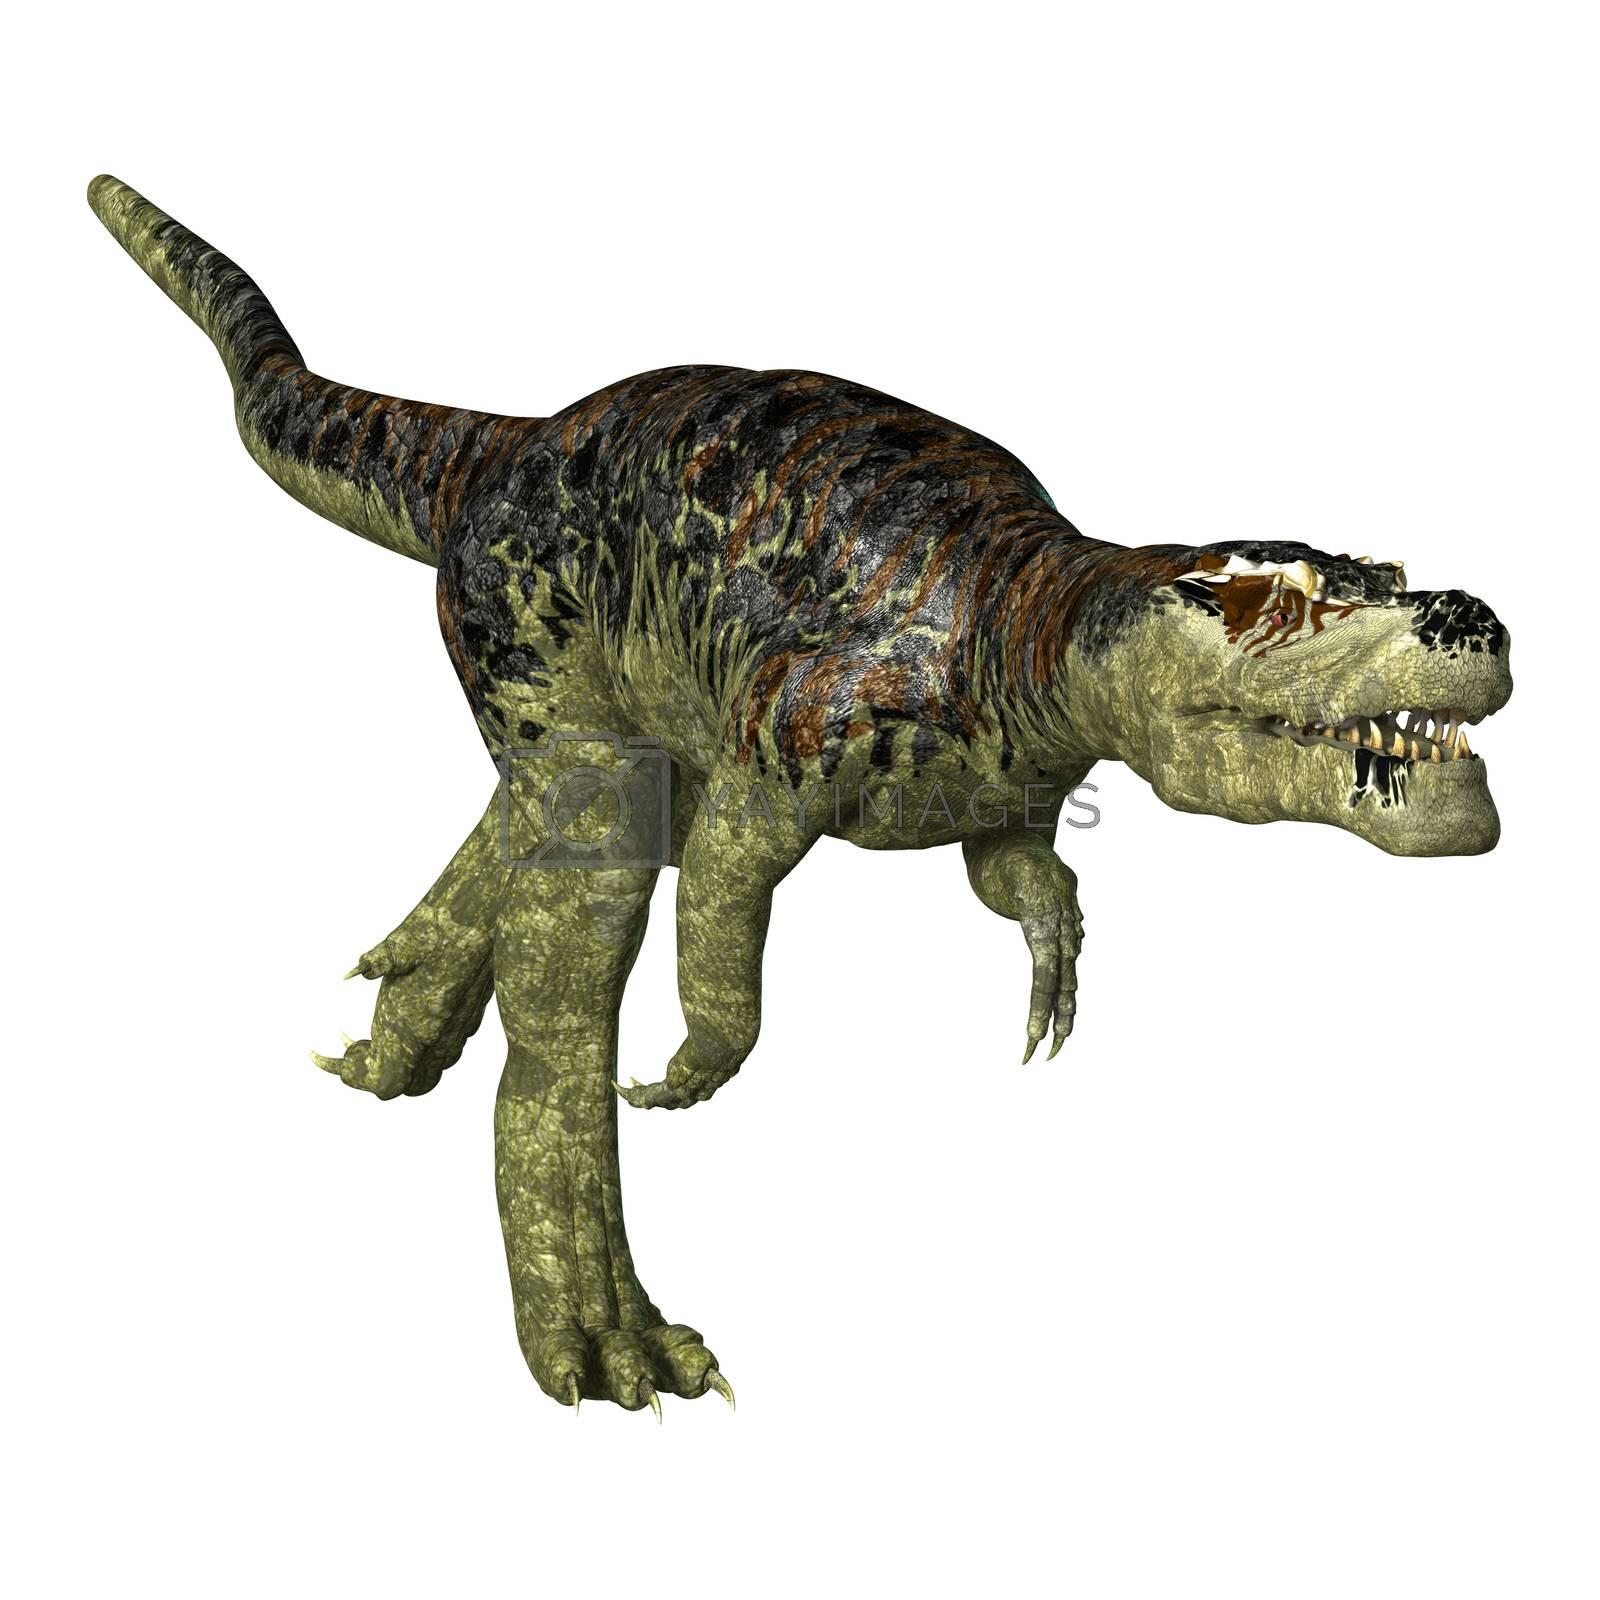 3D digital render of a dinosaur Tyrannosaurus Rex running isolated on white background